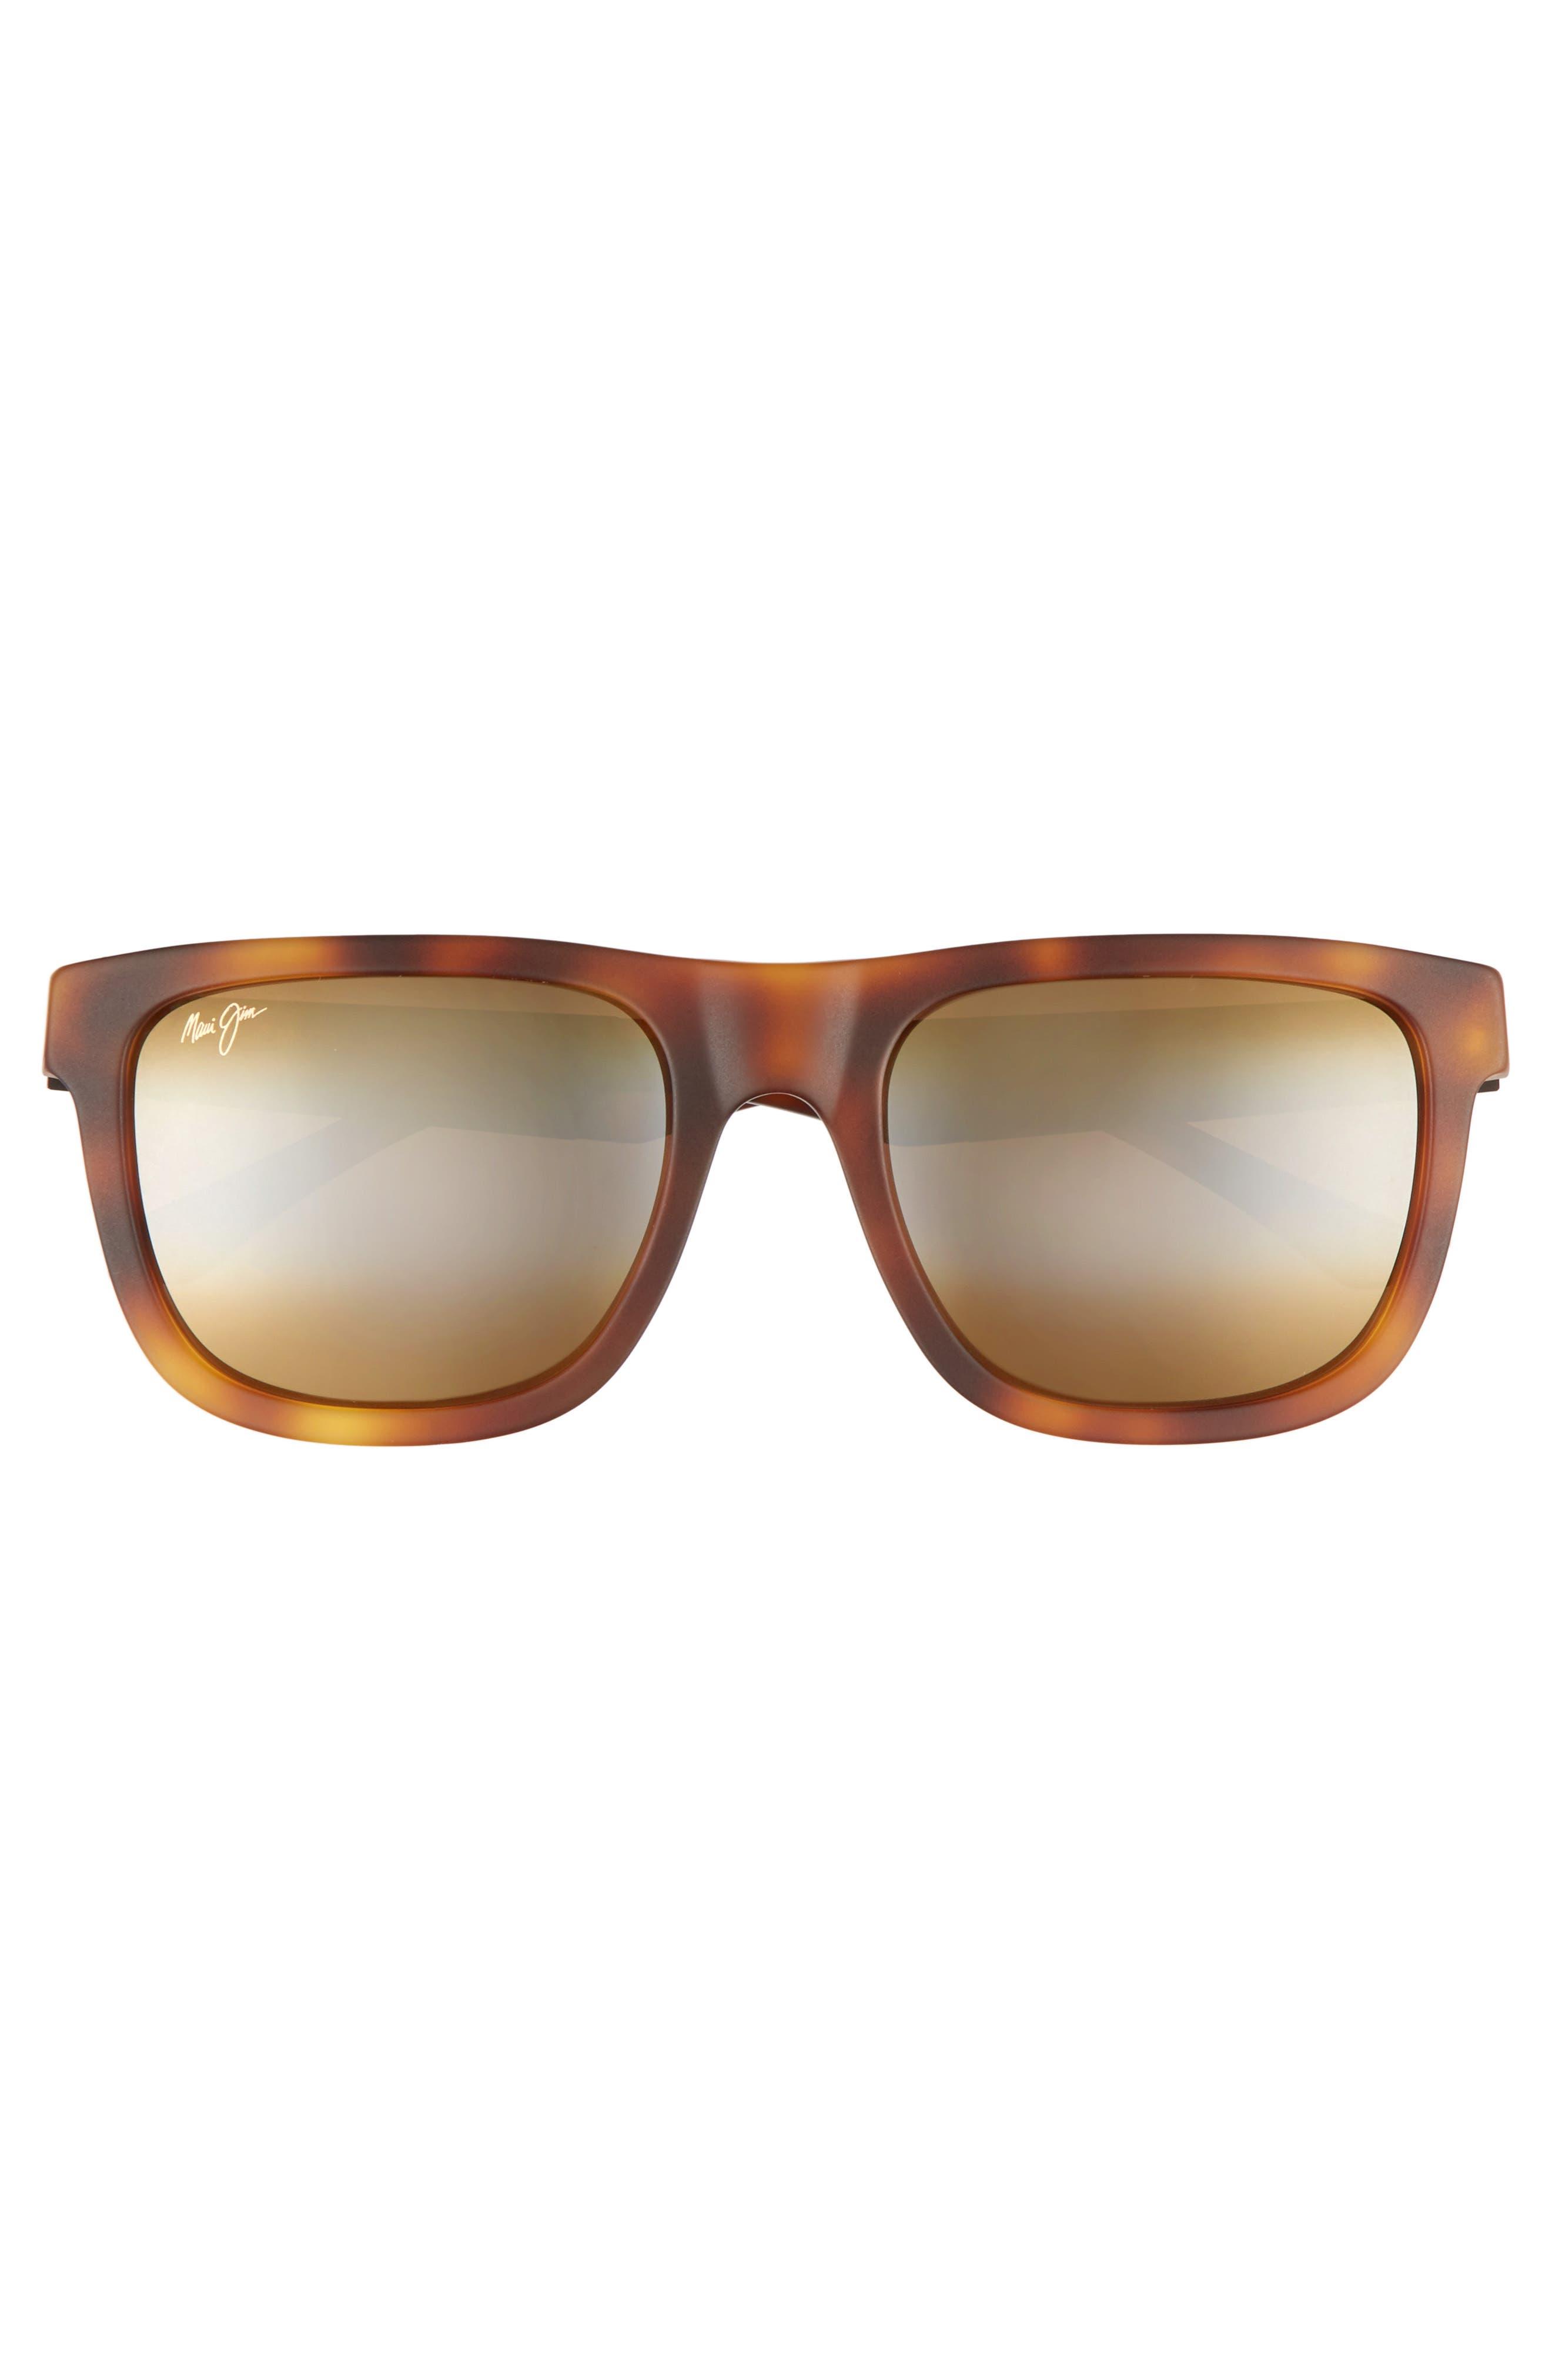 Talk Story 55mm Polarized Sunglasses,                             Alternate thumbnail 2, color,                             Matte Tokyo Tortoise/ Bronze